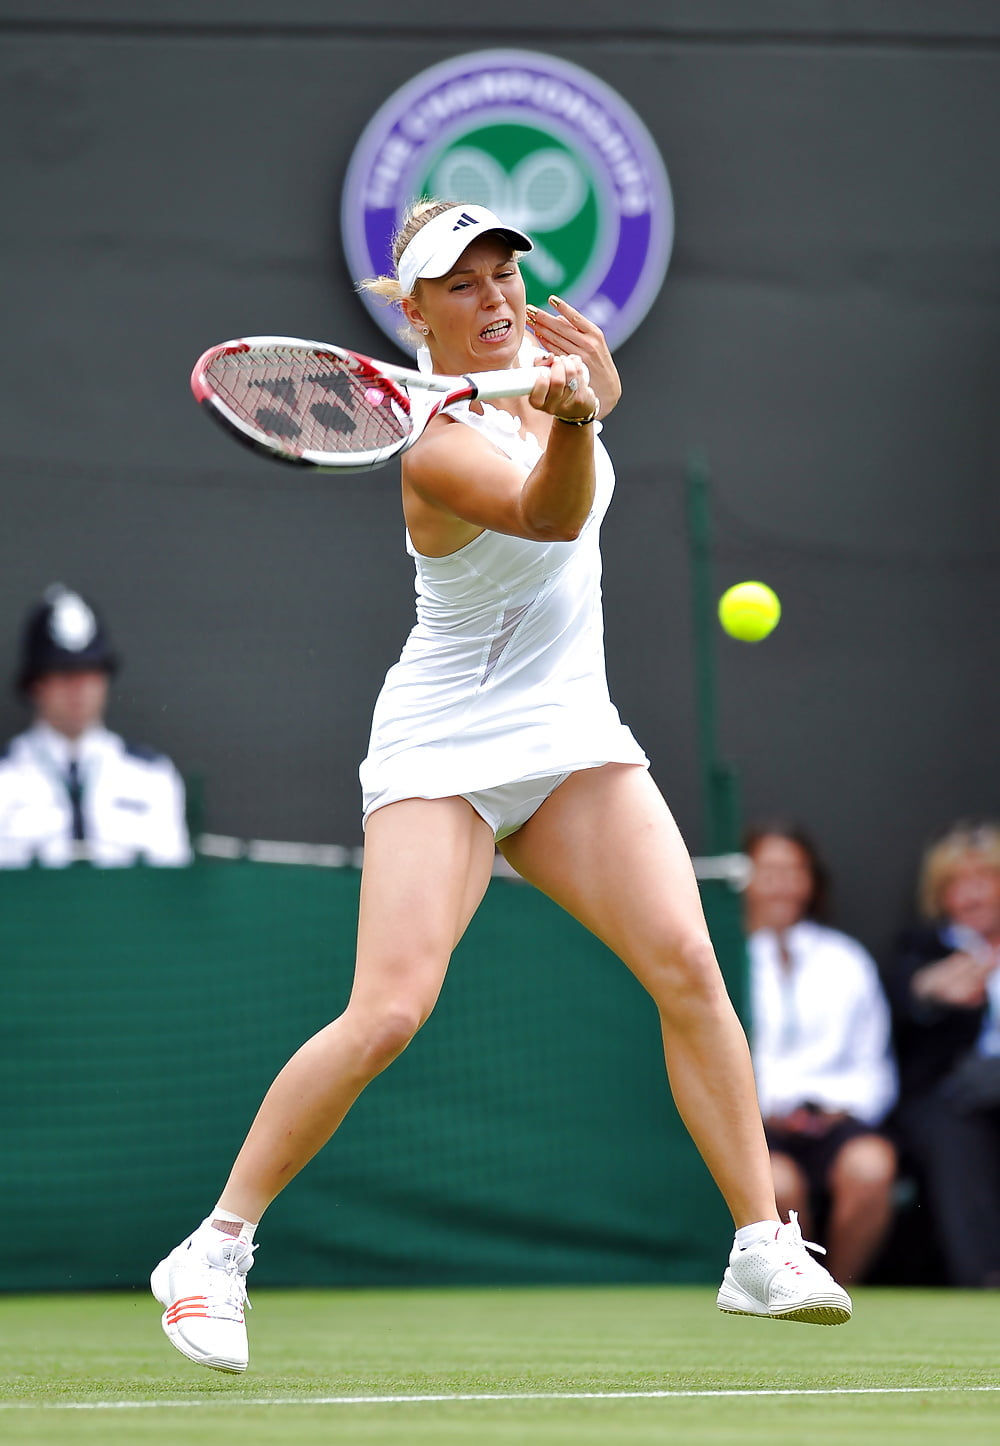 Tennis Upskirt, Oops Martina Hingis